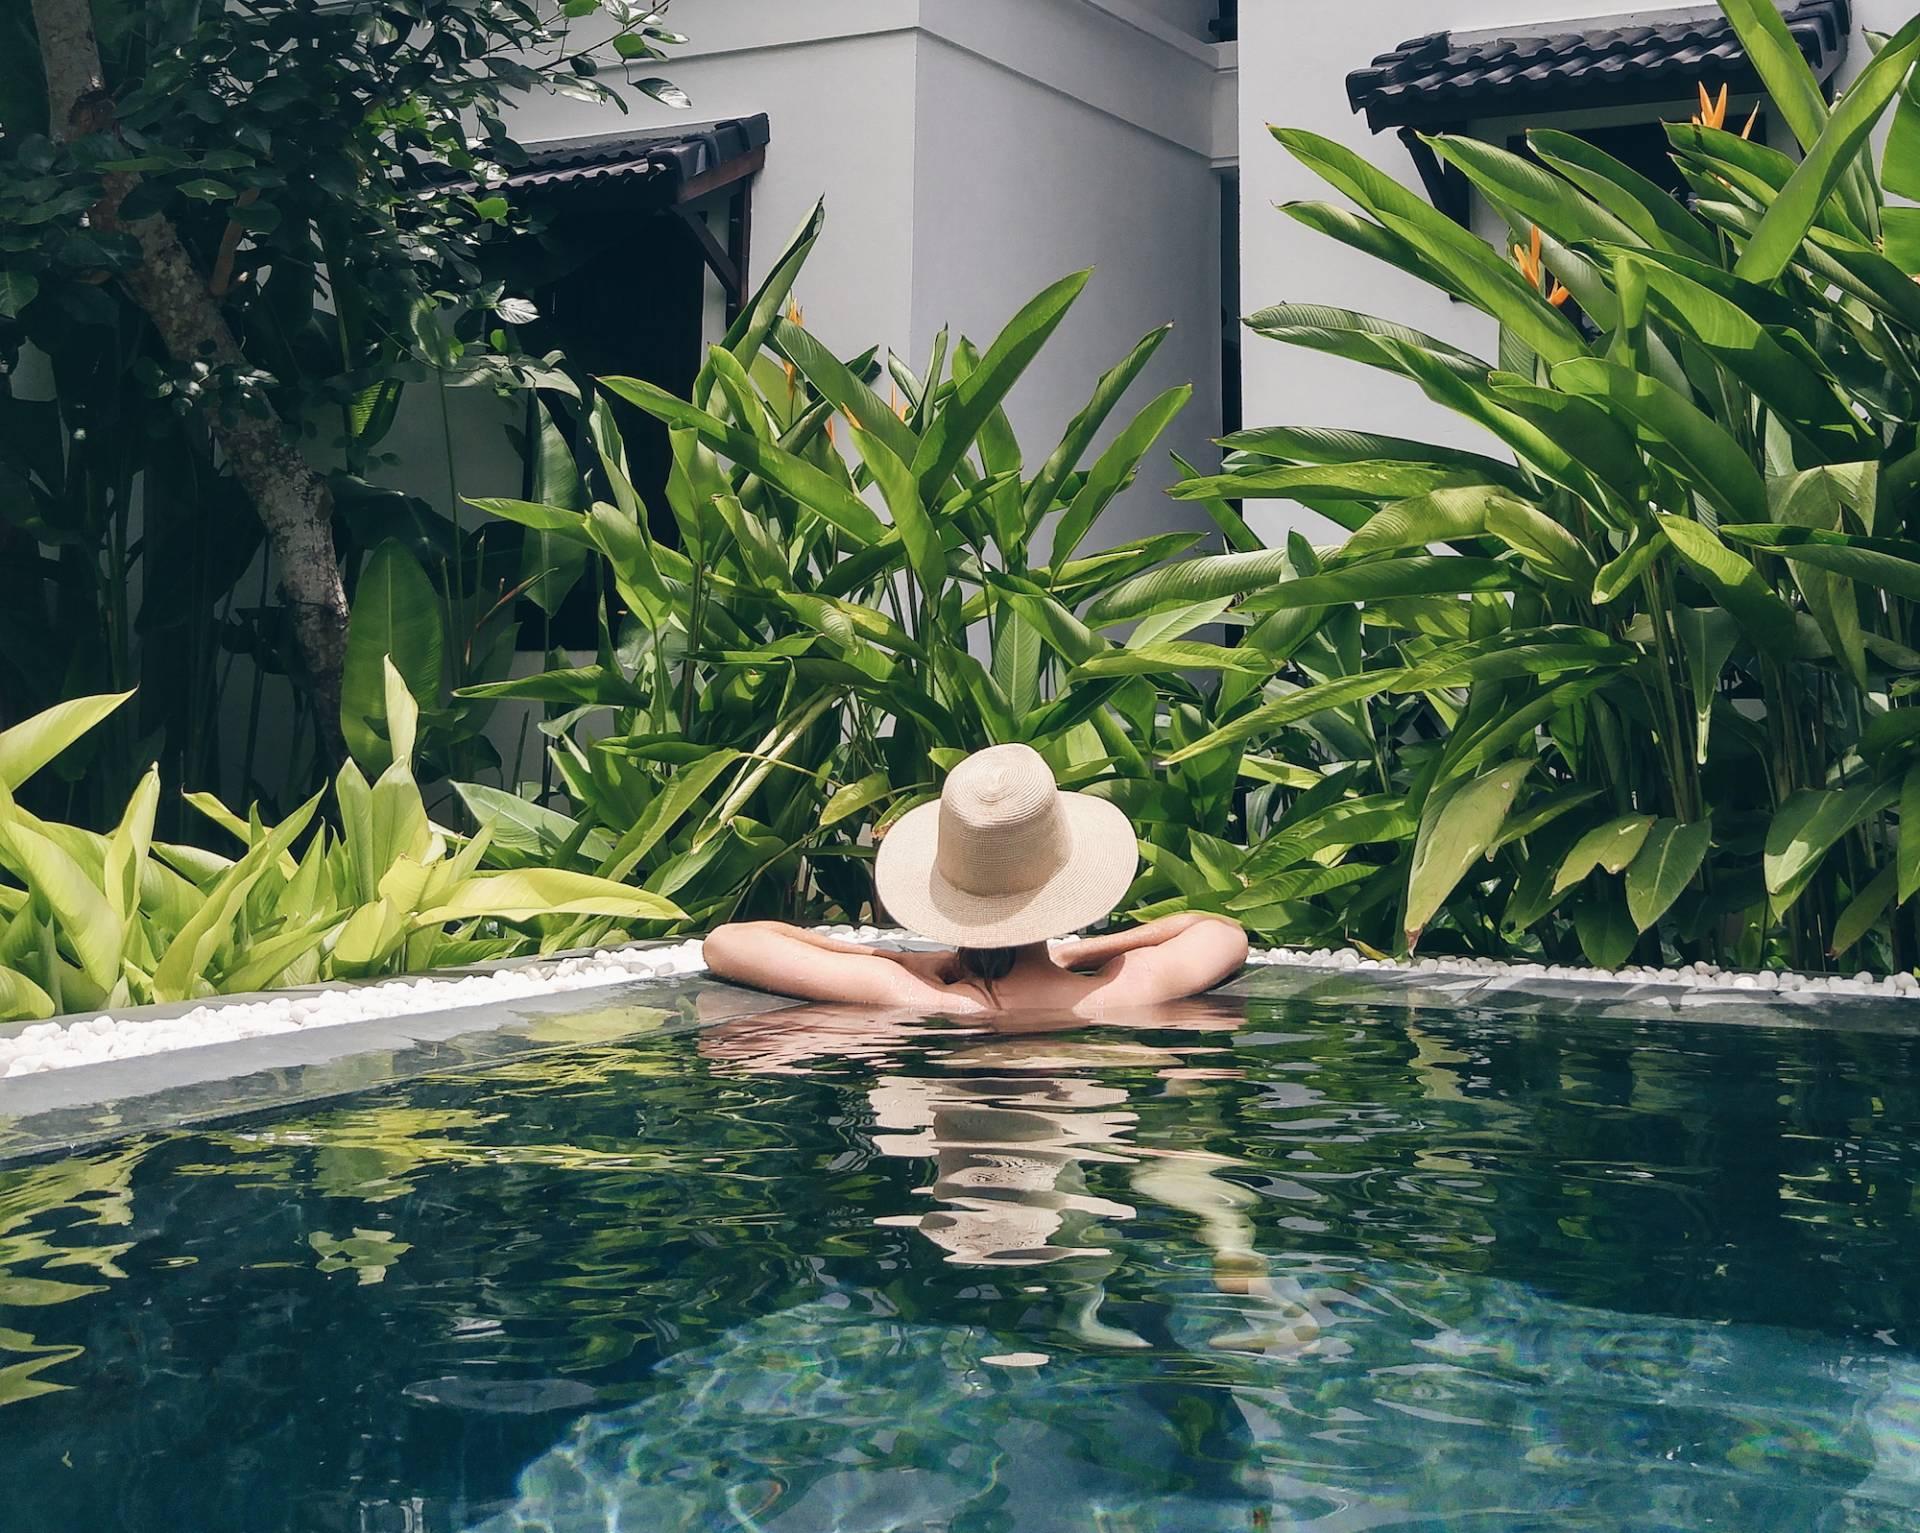 vietnam travel diary | The August Diaries